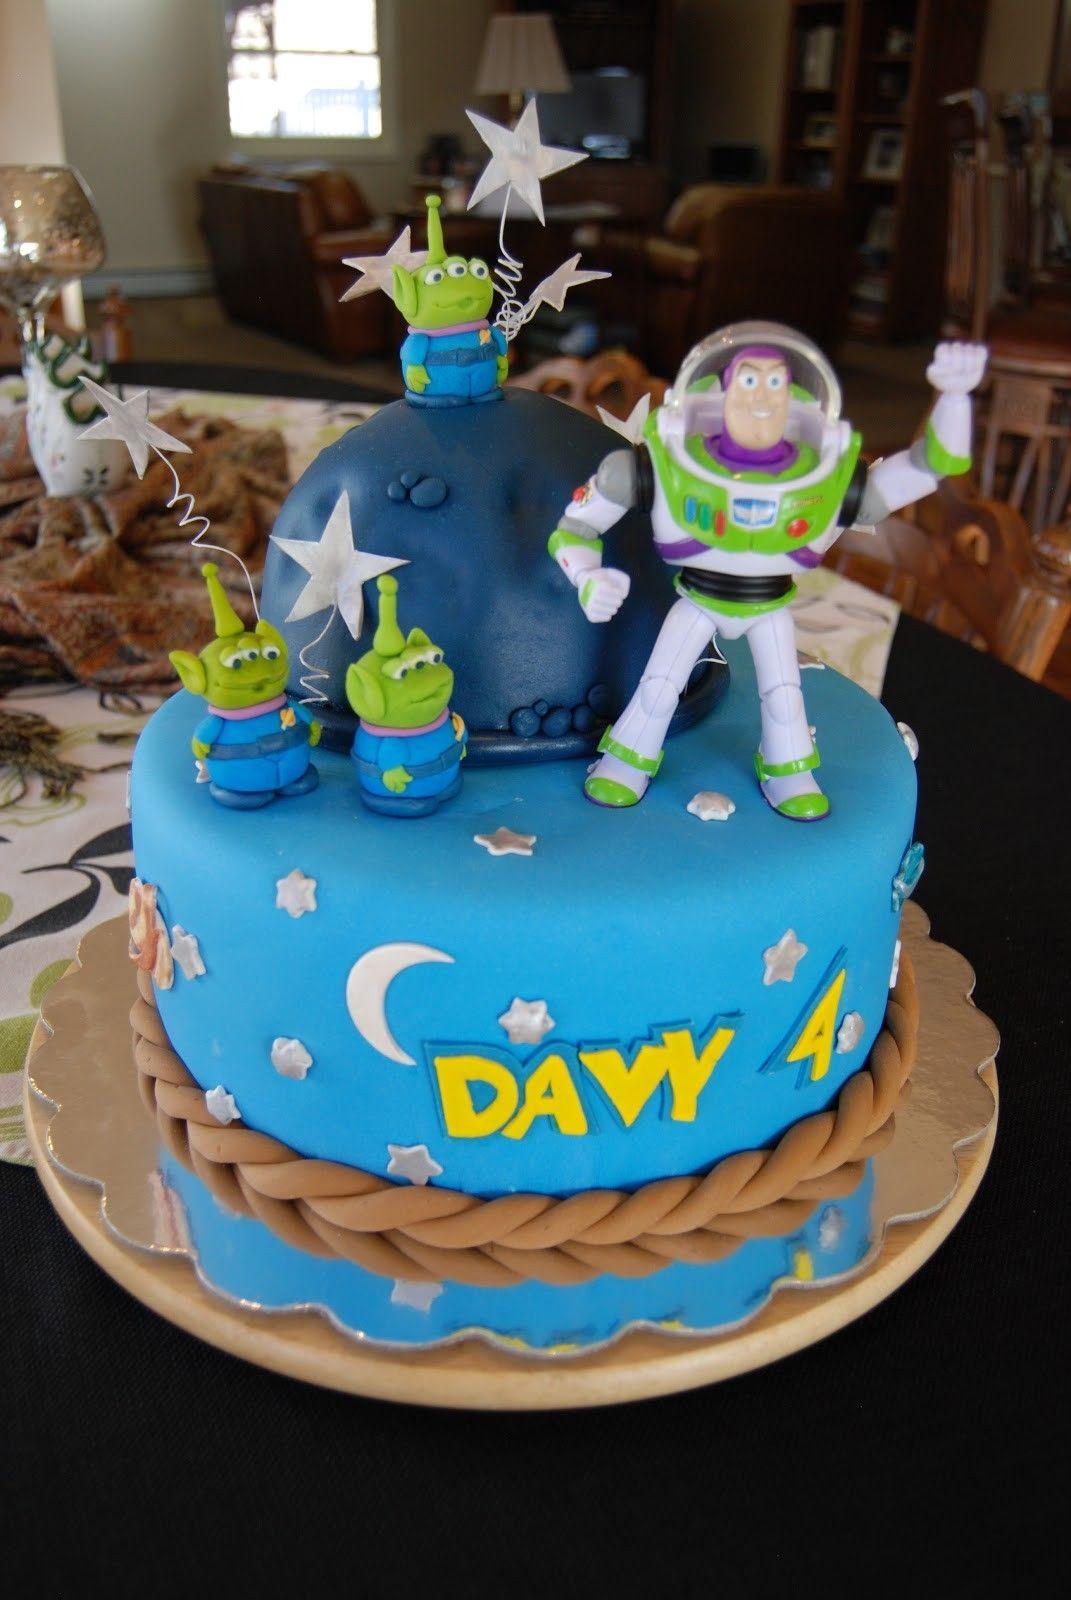 Buzz lightyear cake designs cakes pinterest buzz